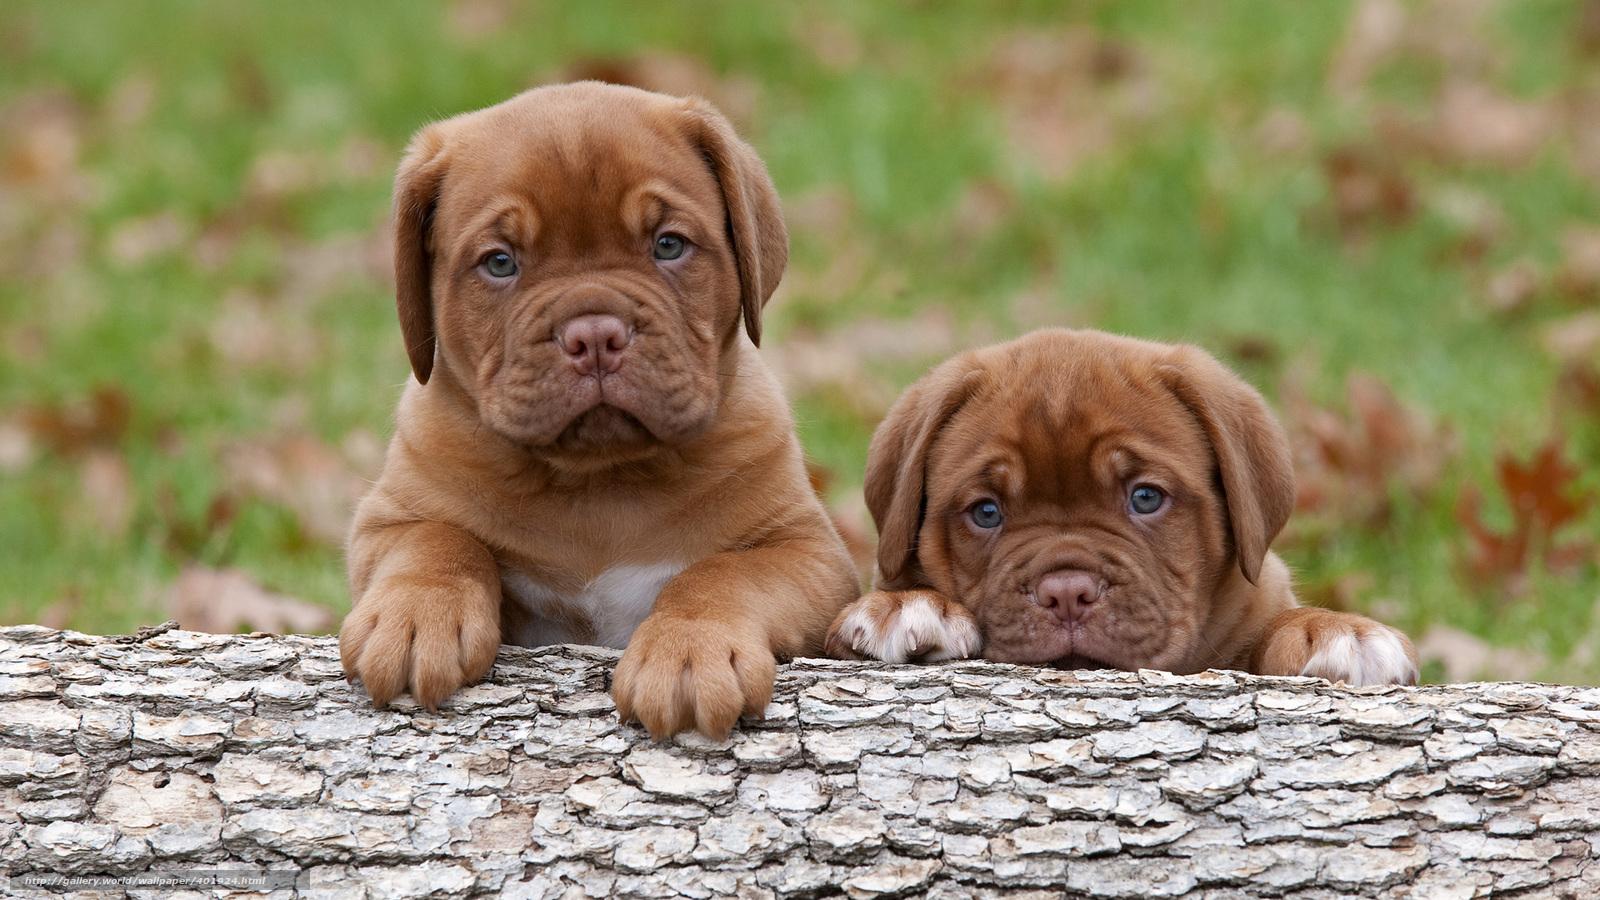 Tlcharger fond d 39 ecran dogue de bordeaux chiots chiens for Fond ecran chiot